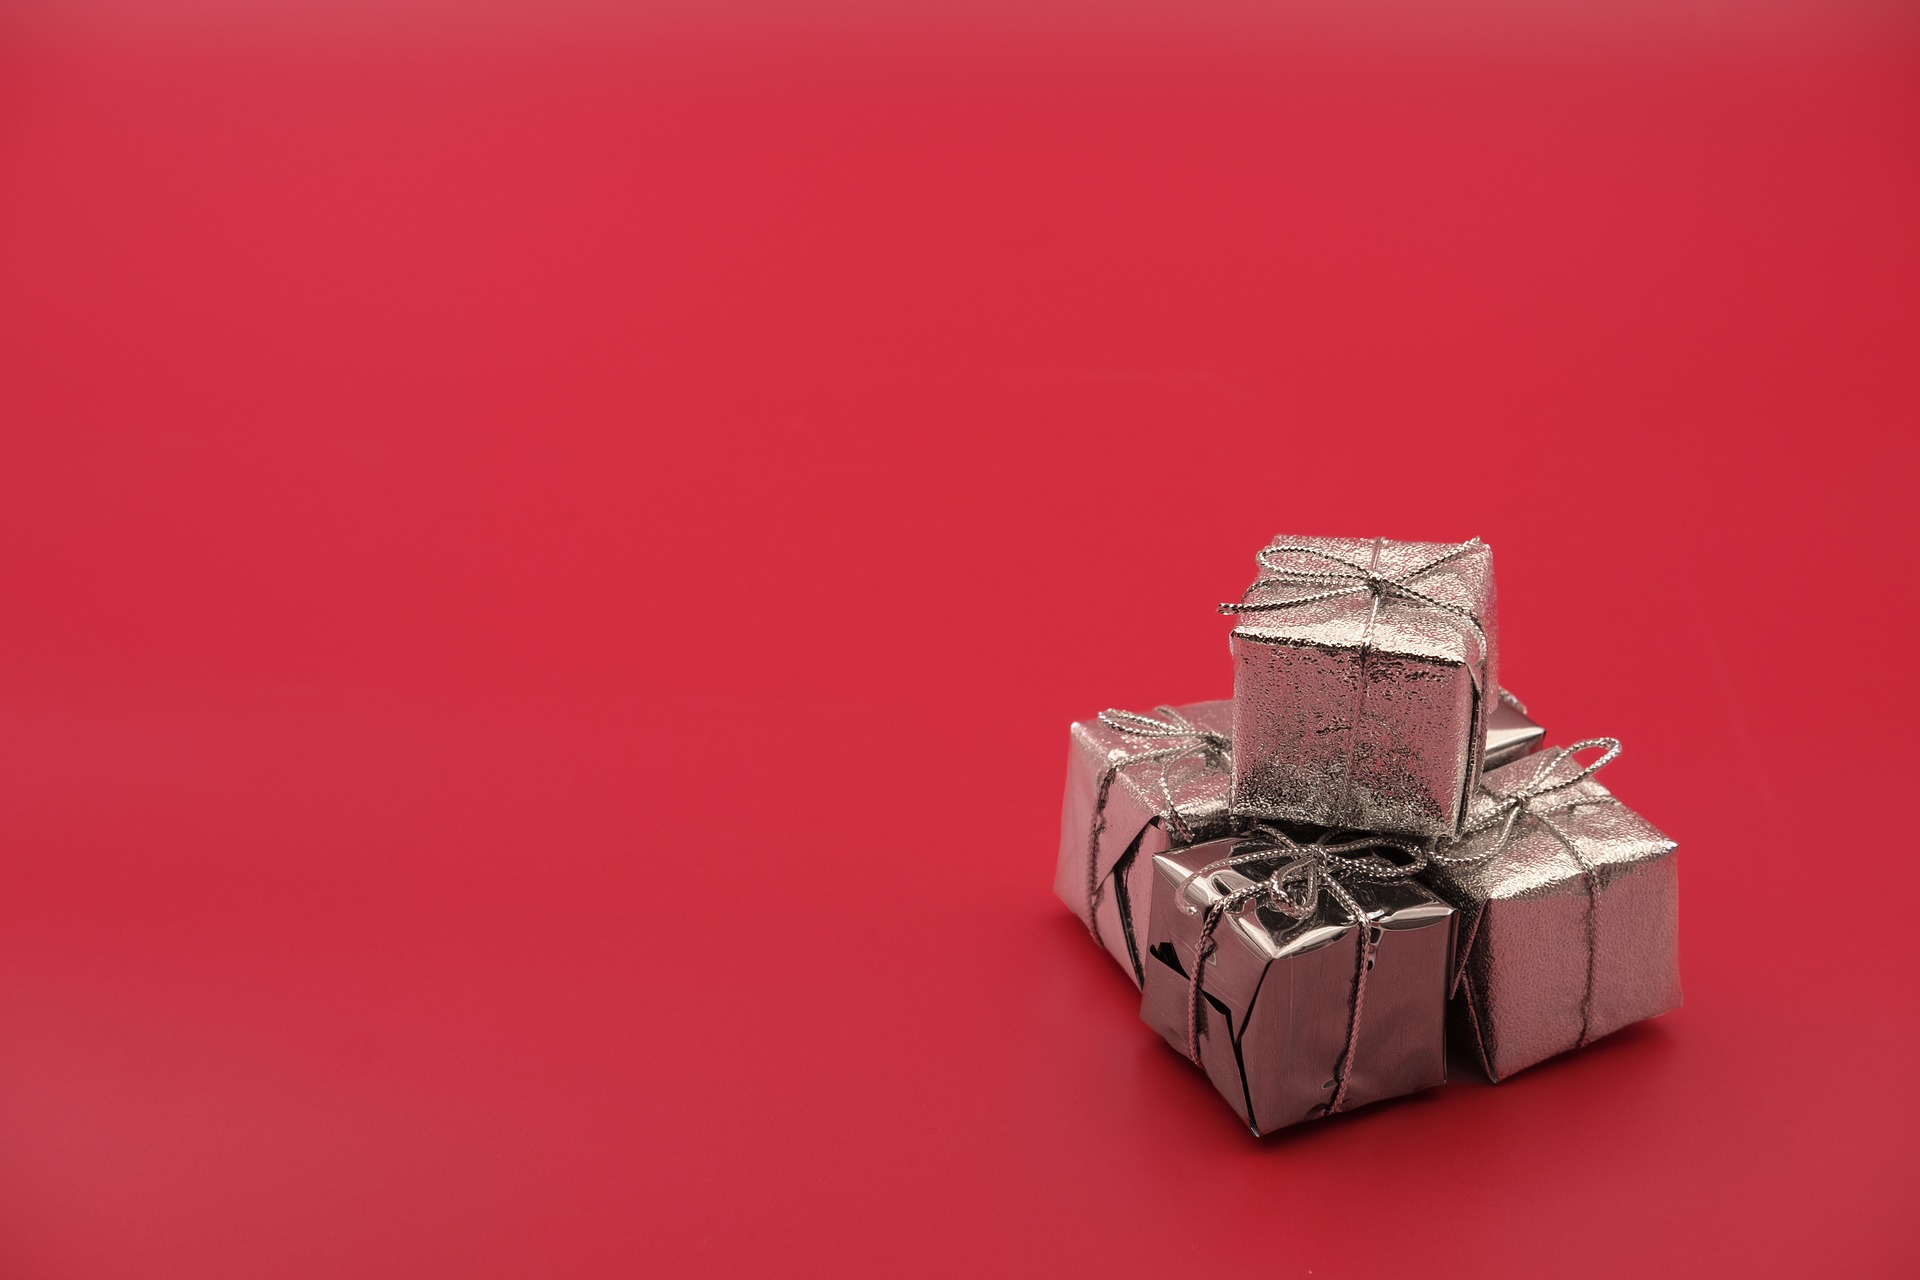 gift-3811744_1920